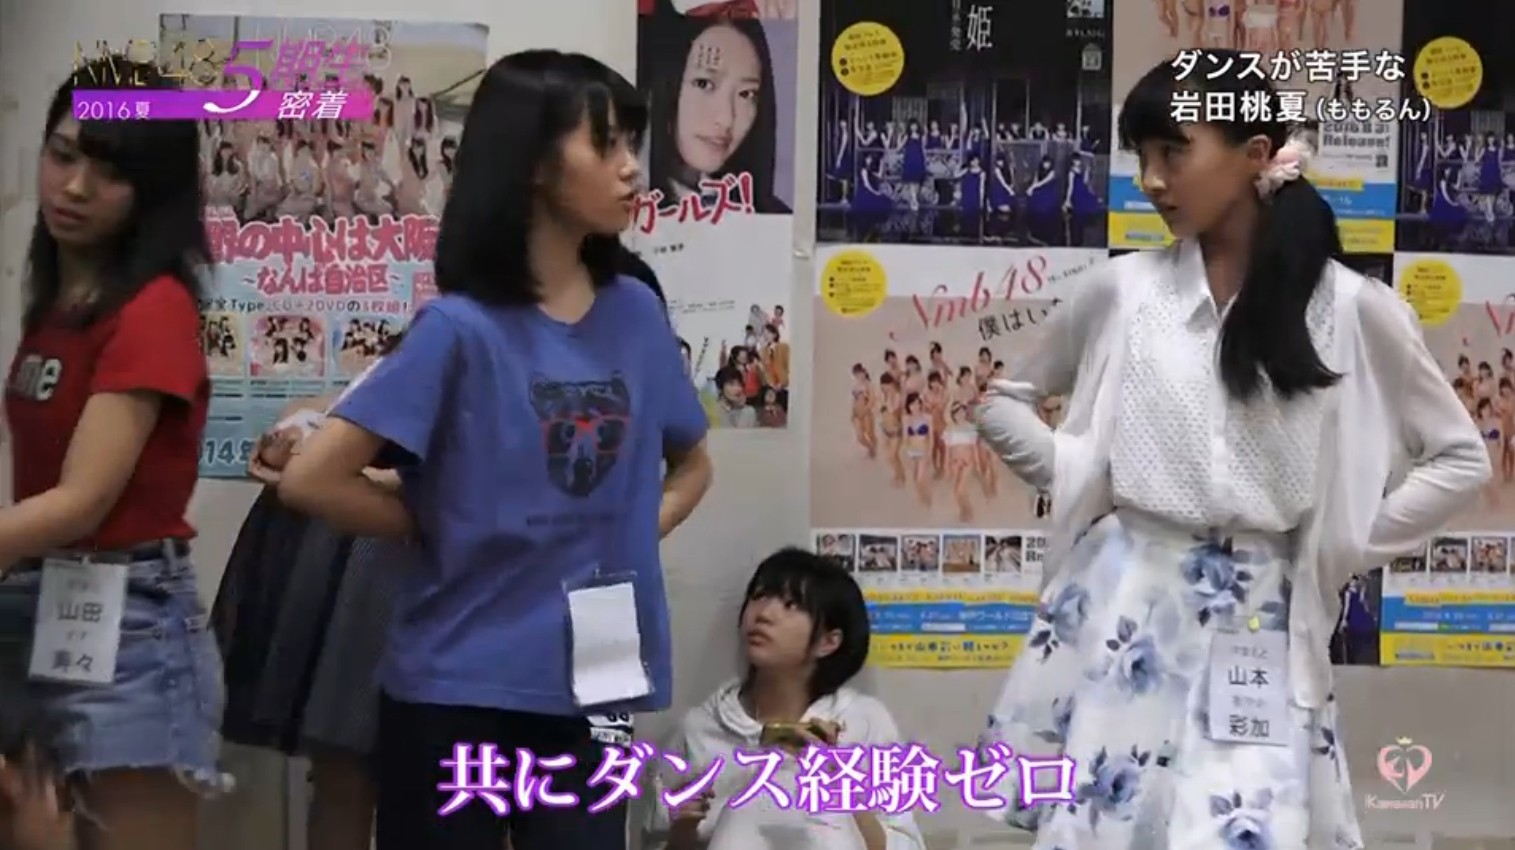 【NMB48】山本彩加 応援スレ☆1【あーやん】YouTube動画>13本 ->画像>860枚